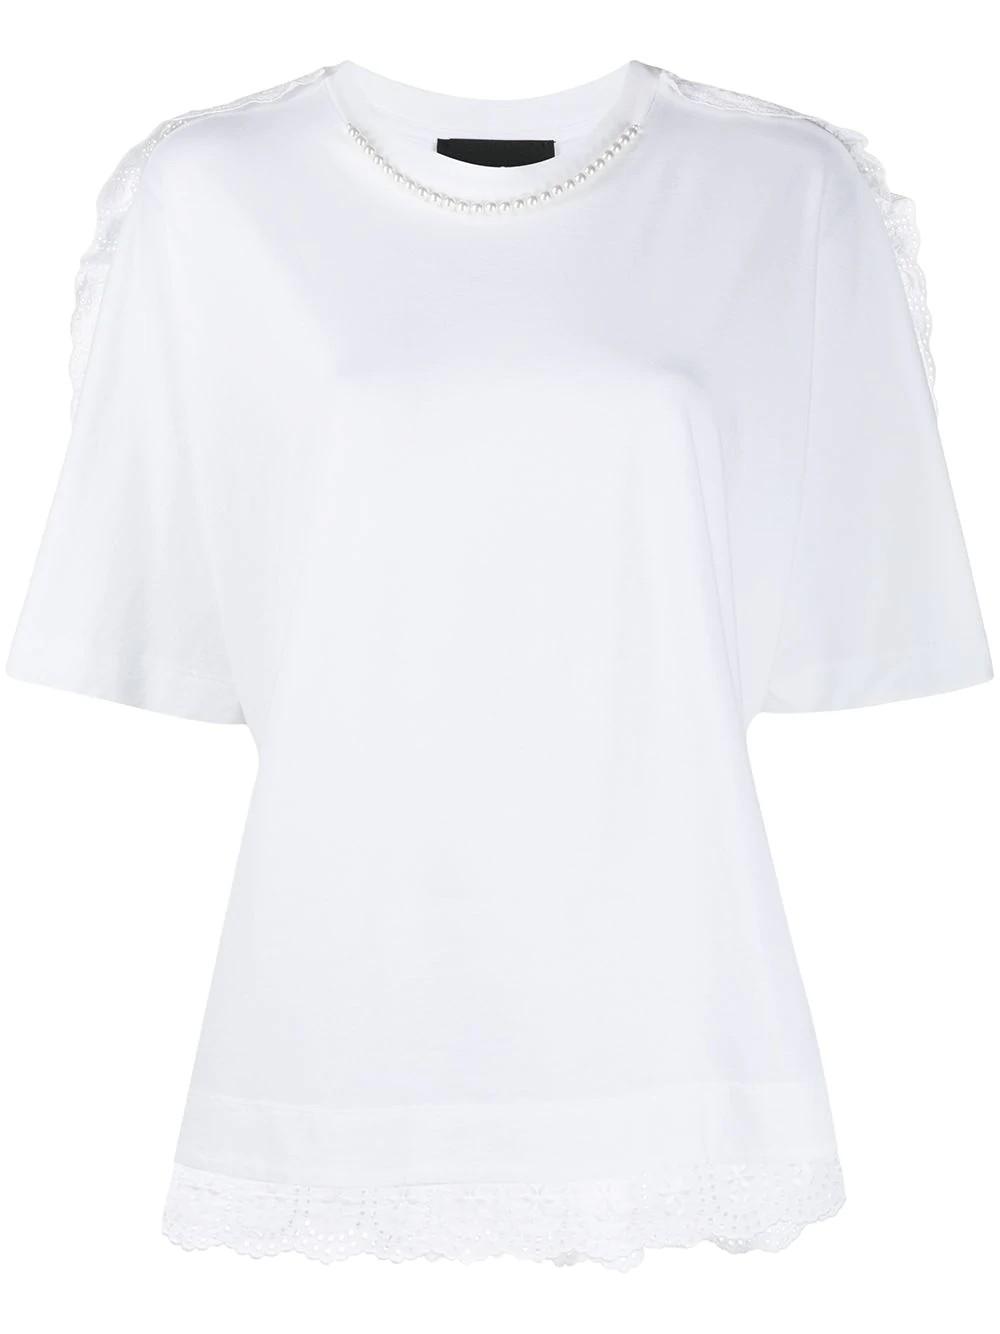 TS269B 0553 WHITE PEARL